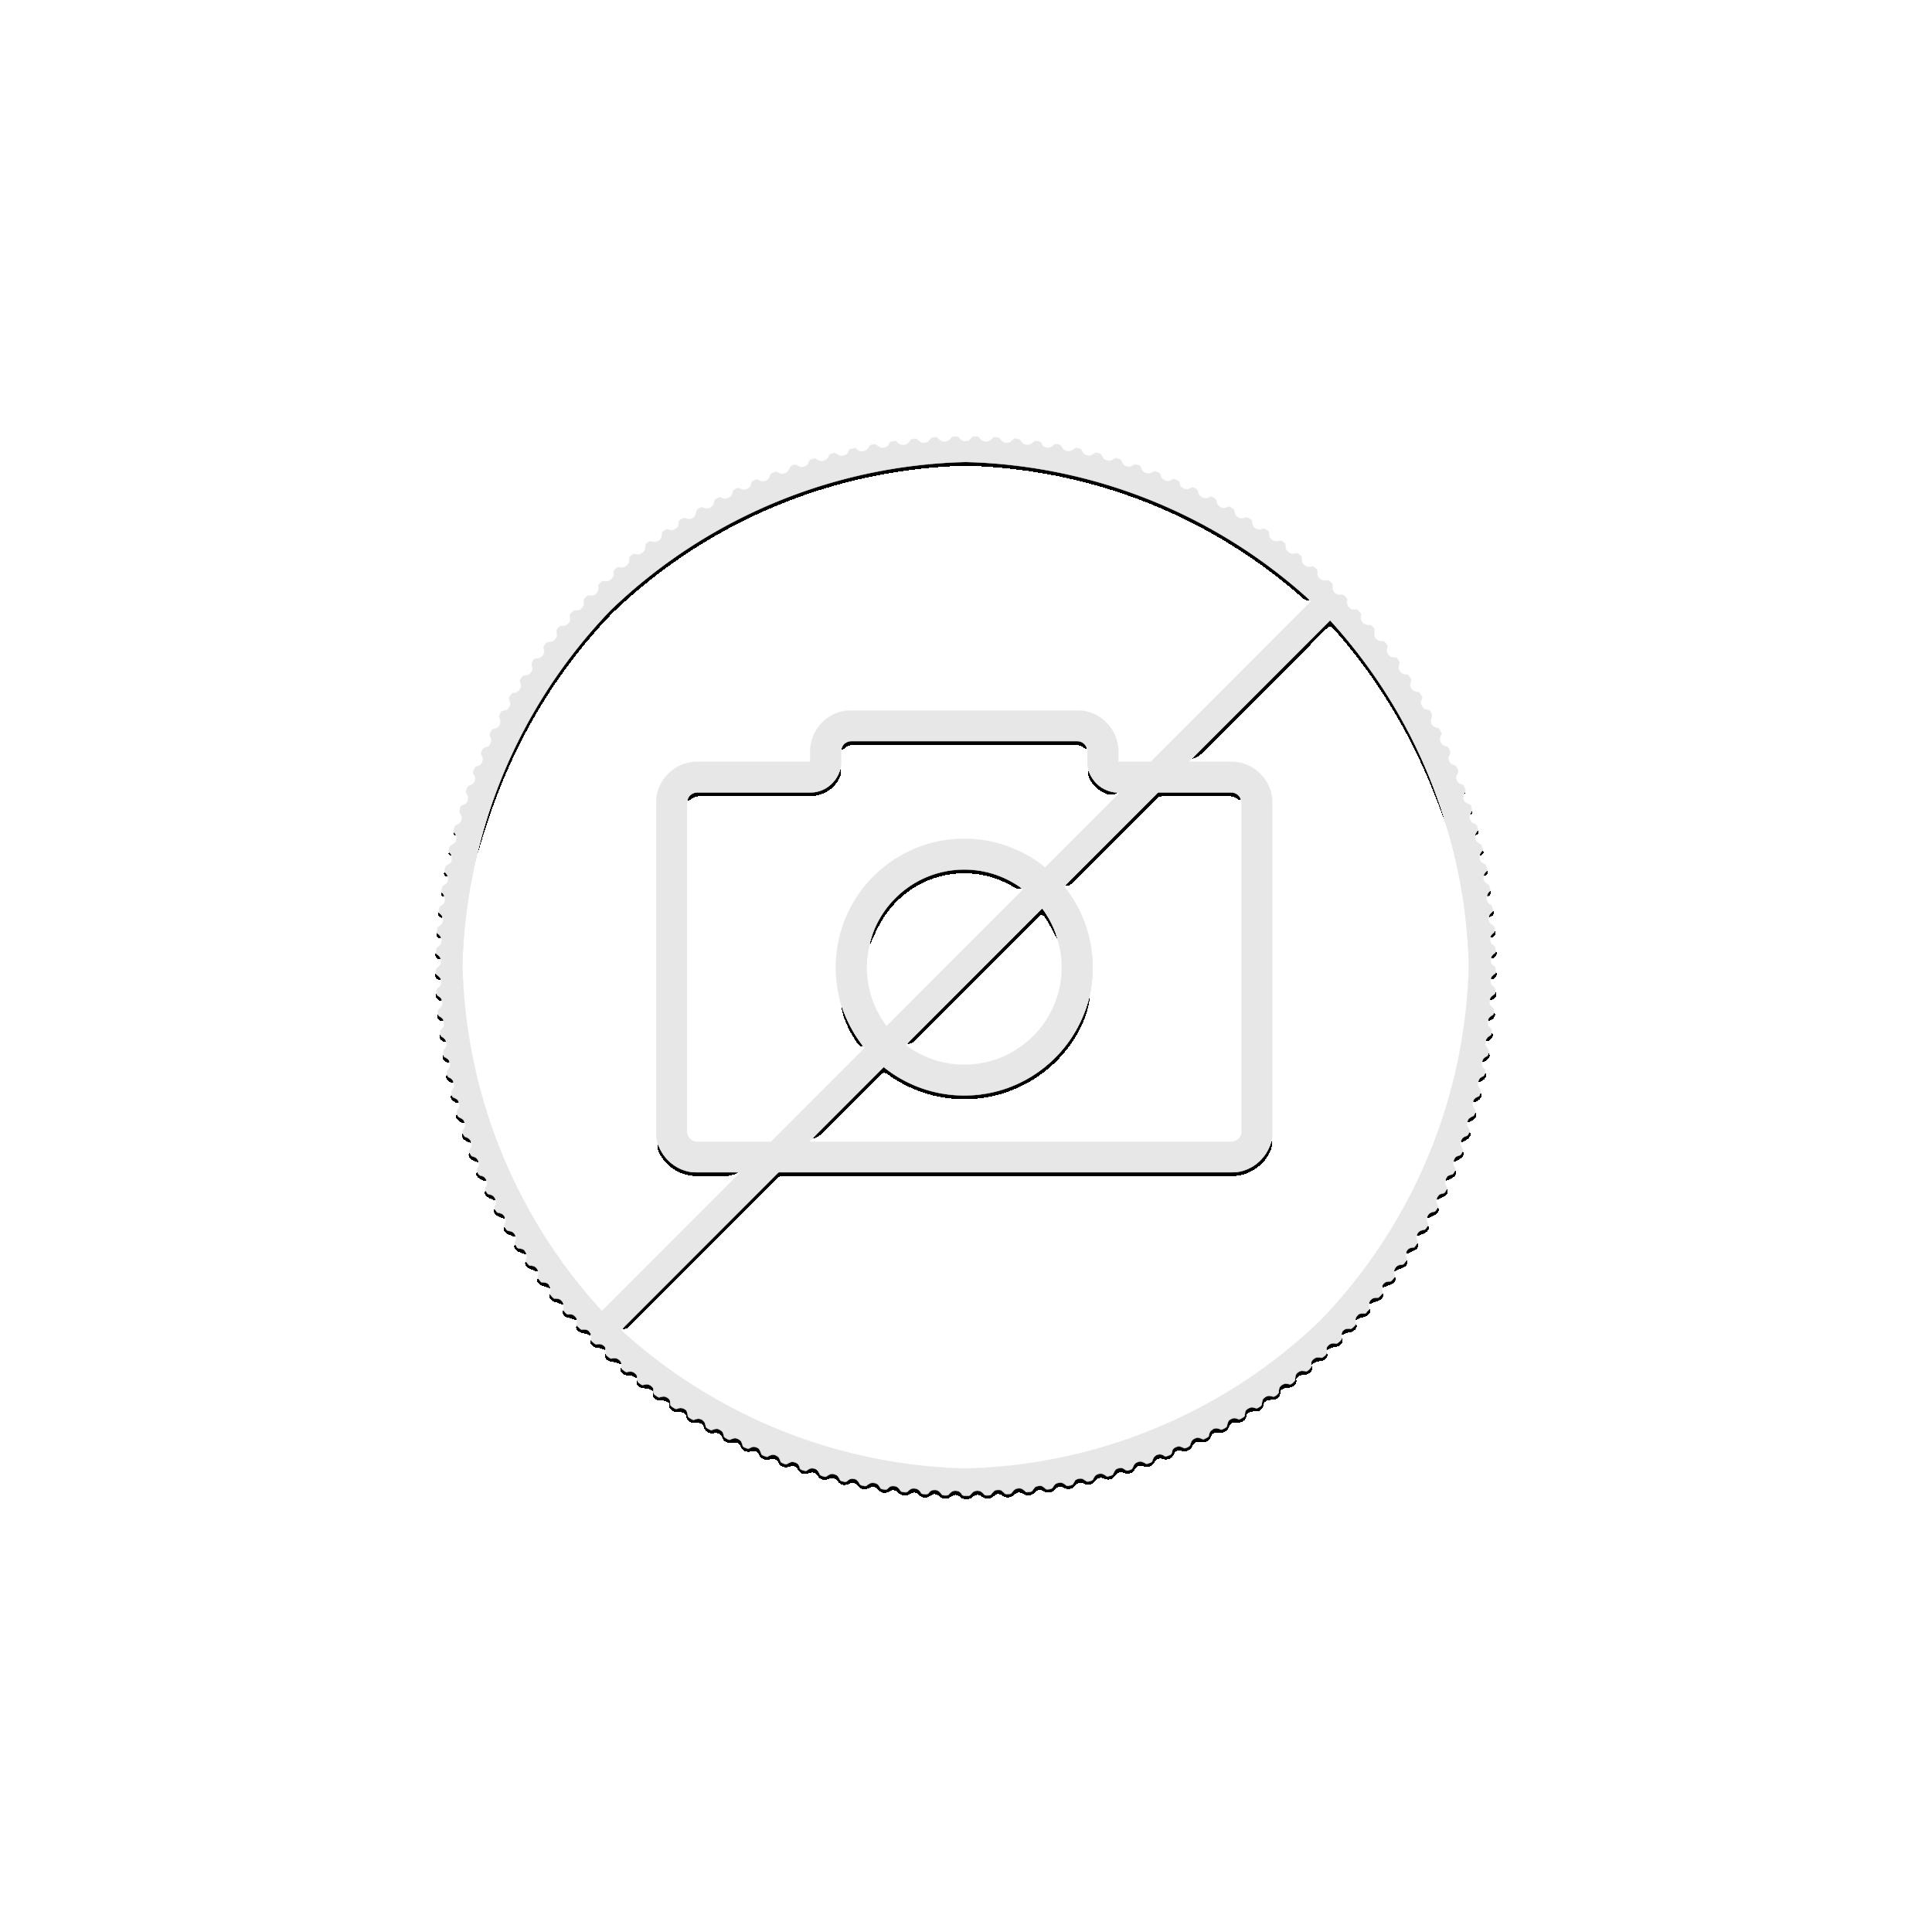 Gouden Kangaroo 2017 - 1 troy ounce puur goud